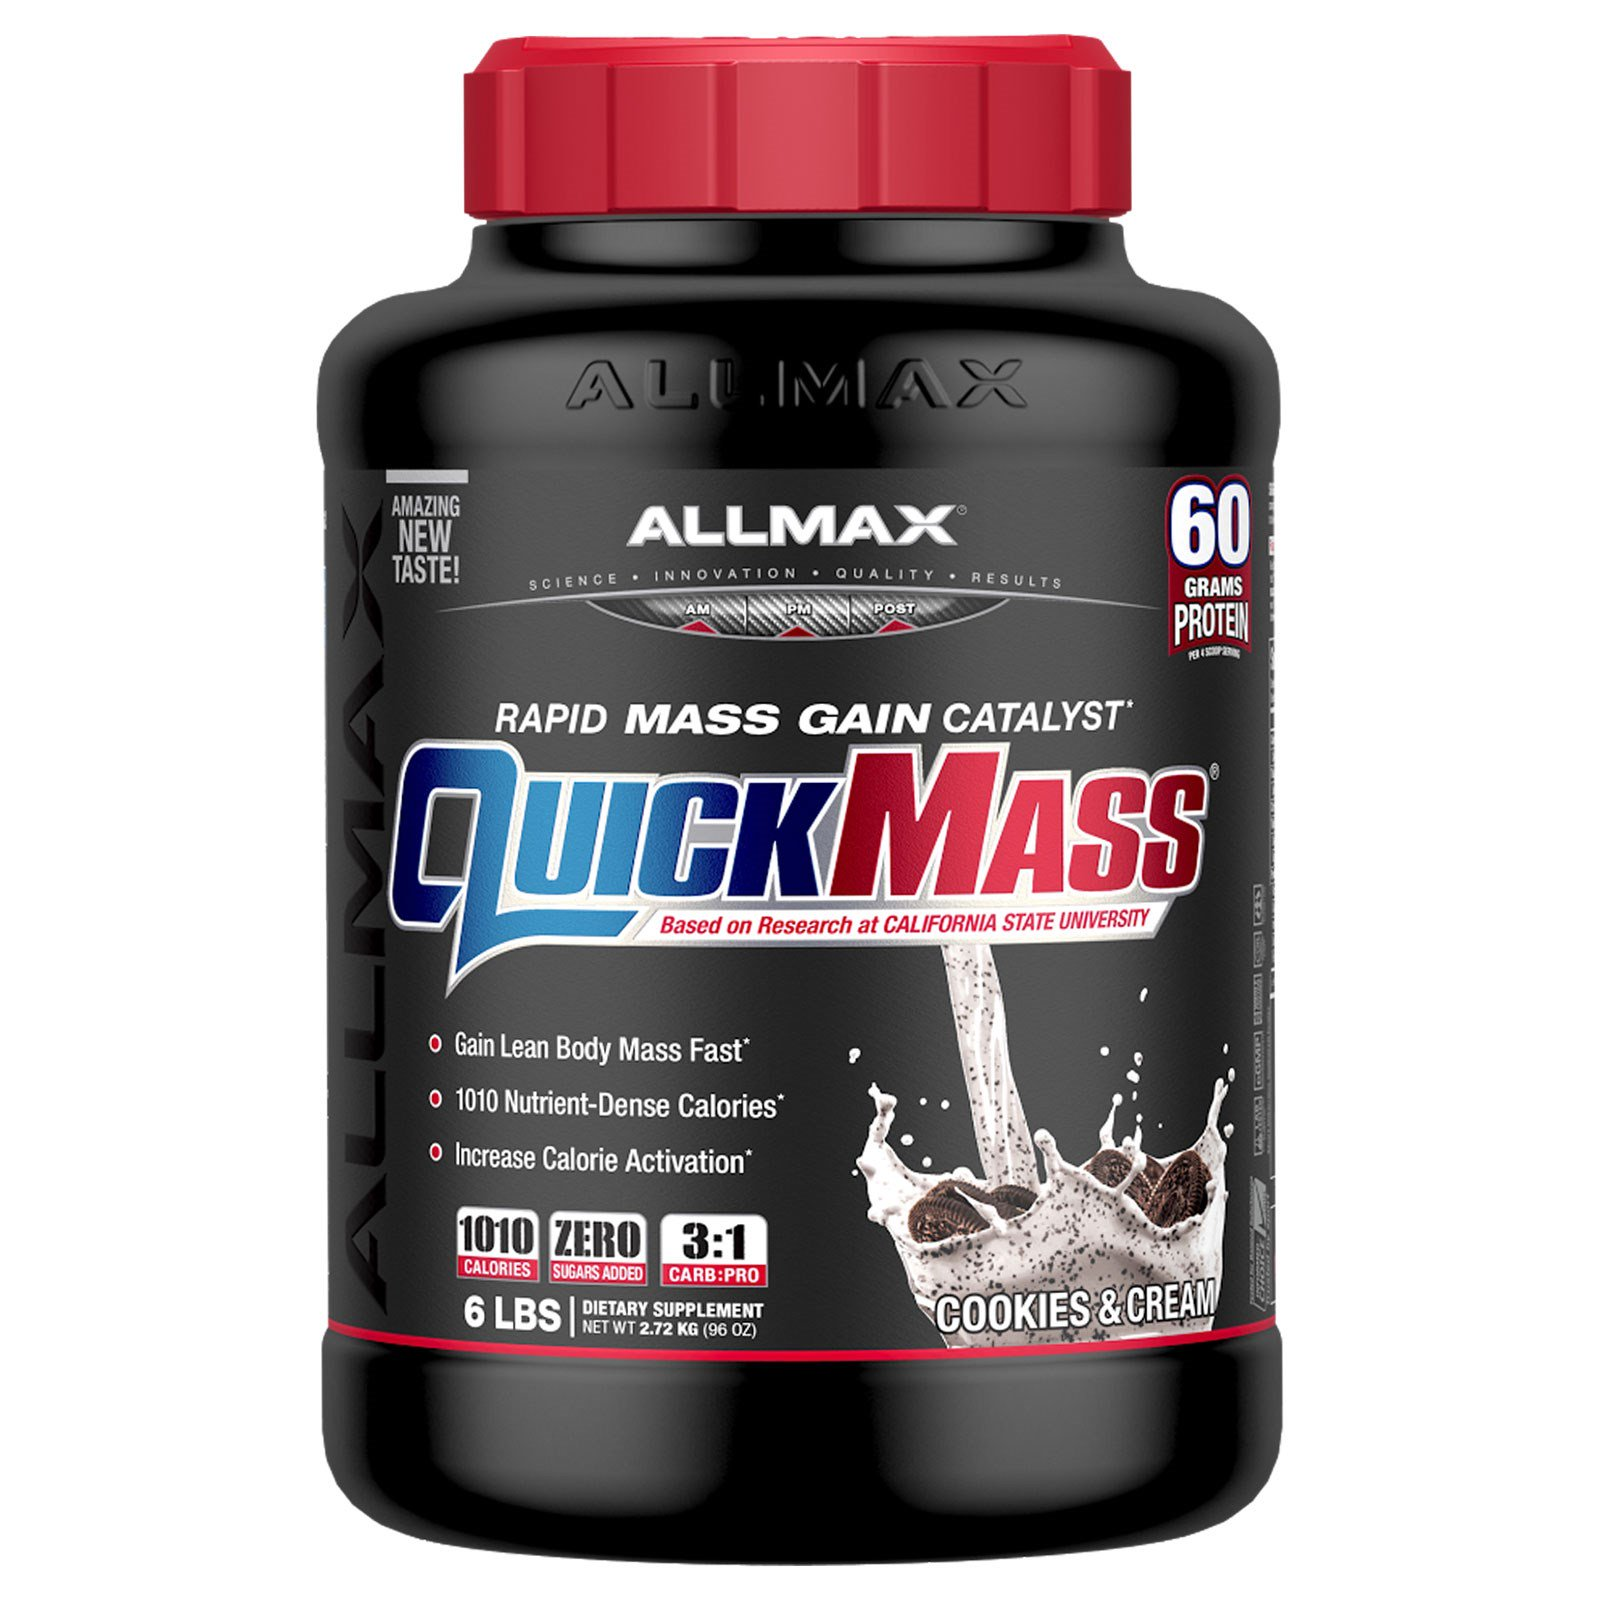 ALLMAX Nutrition, QuickMass, Weight Gainer, Rapid Mass Gain Catalyst, Cookies & Cream, 6 lbs (2.72 kg)